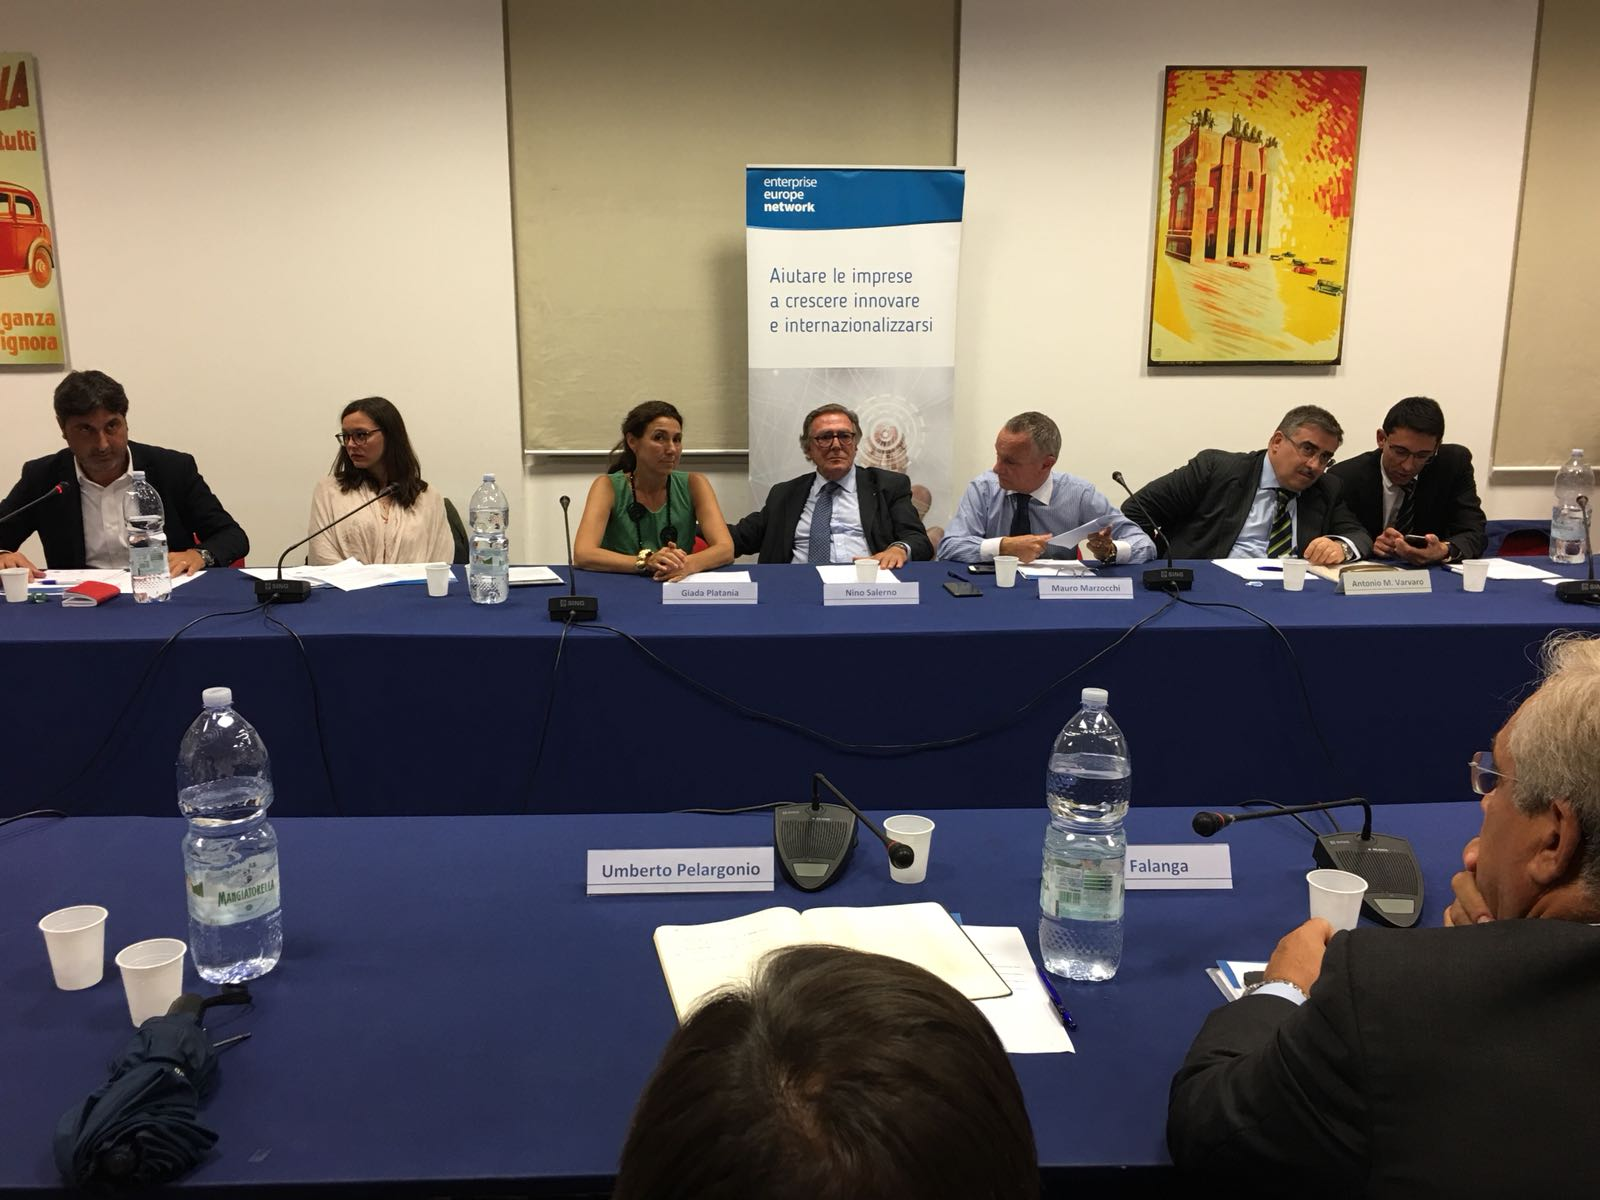 Imprese: Sicindustria sigla intesa con Camera italo-araba